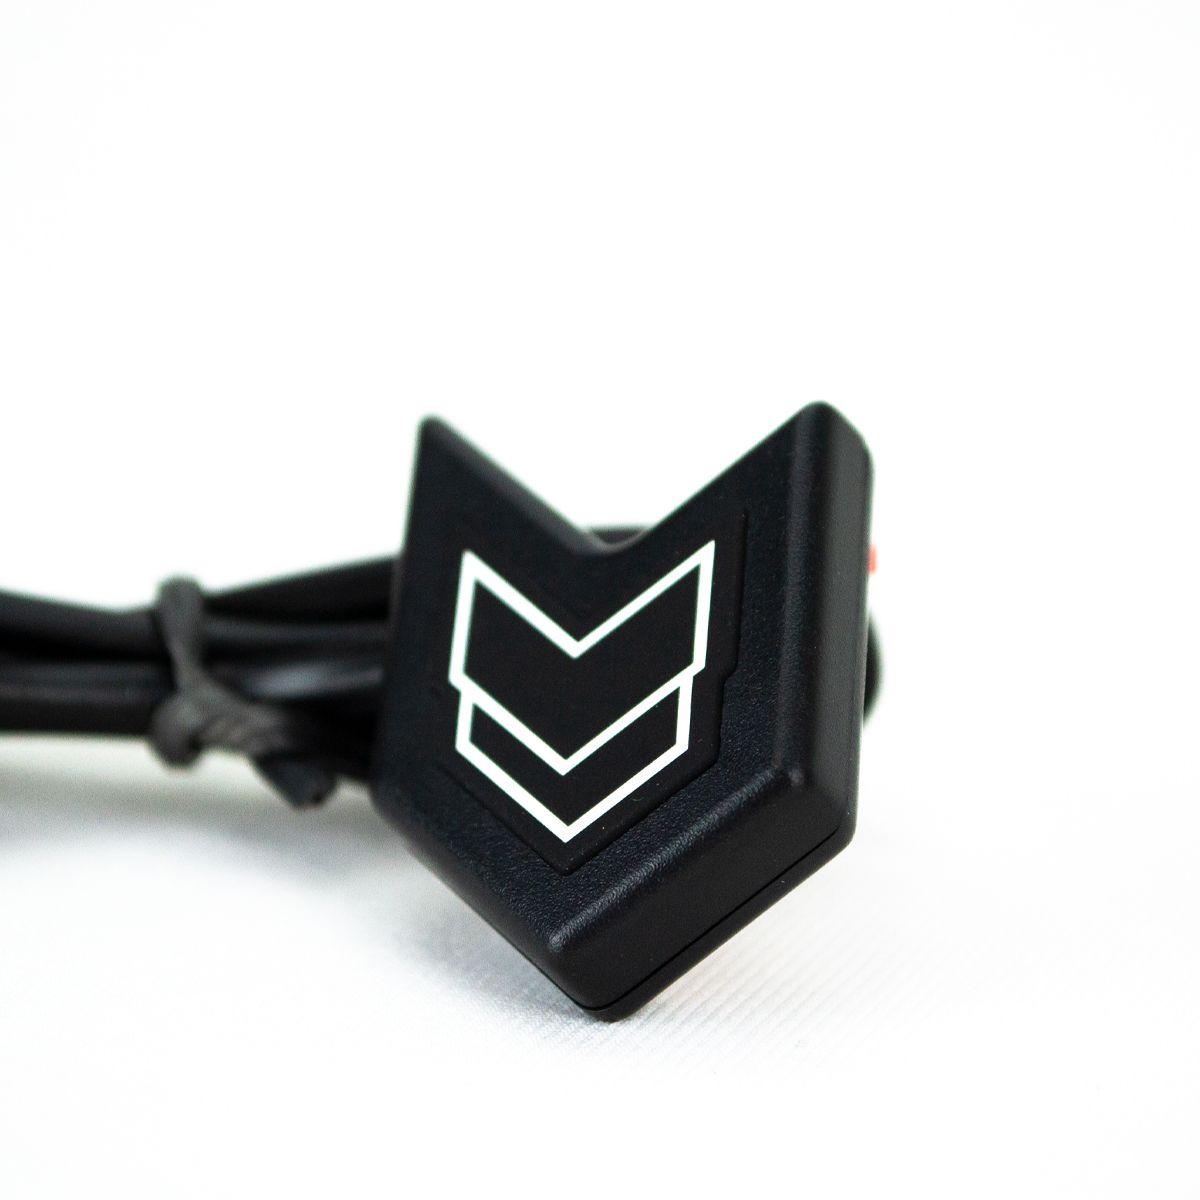 Chip de Pedal Shiftpower Para Fiat Toro